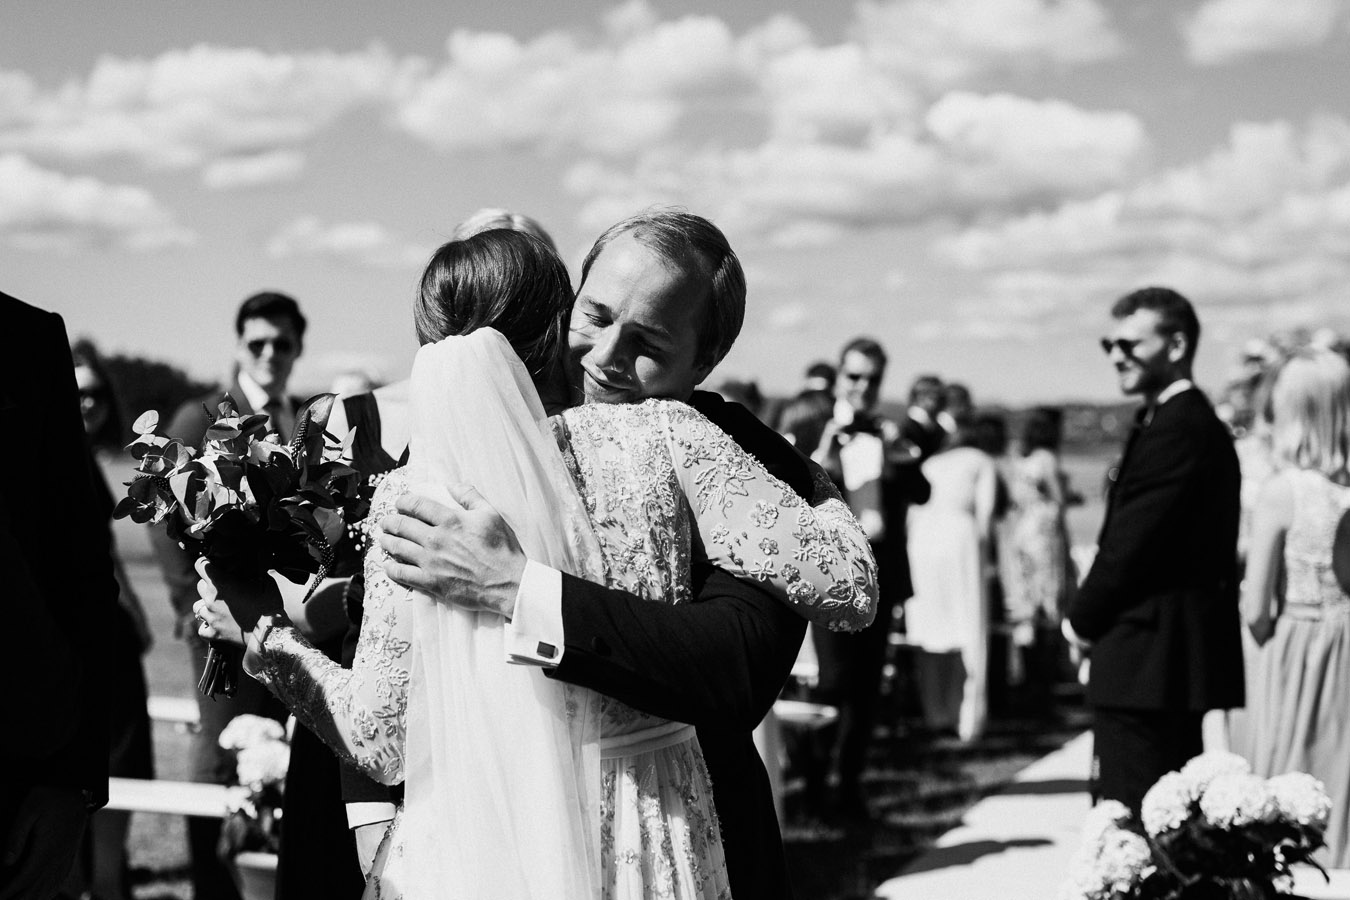 Fotograf-Tone-Tvedt-bryllup-104.jpg